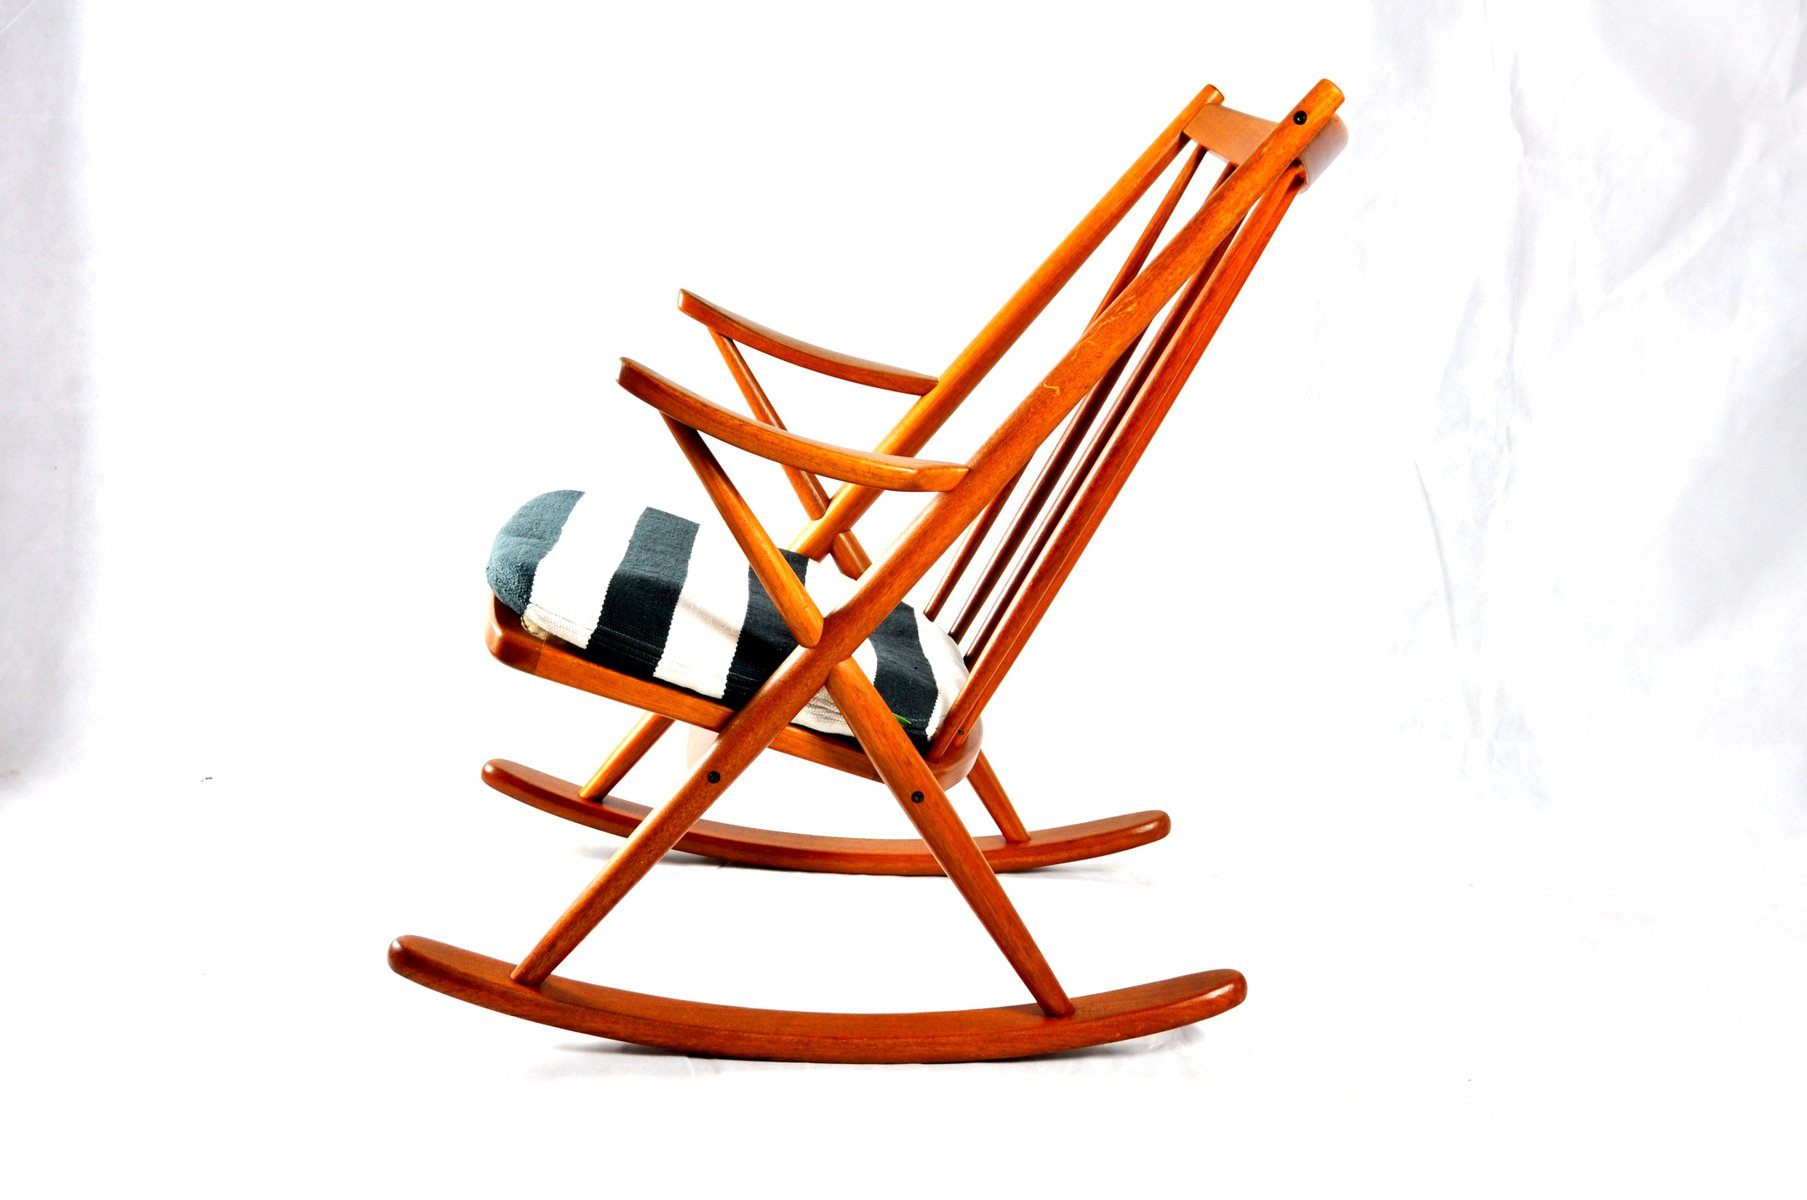 Frank reenskaug rocking chair - Rocking Chair 182 By Frank Reenskaug For Bramin 5 1 393 00